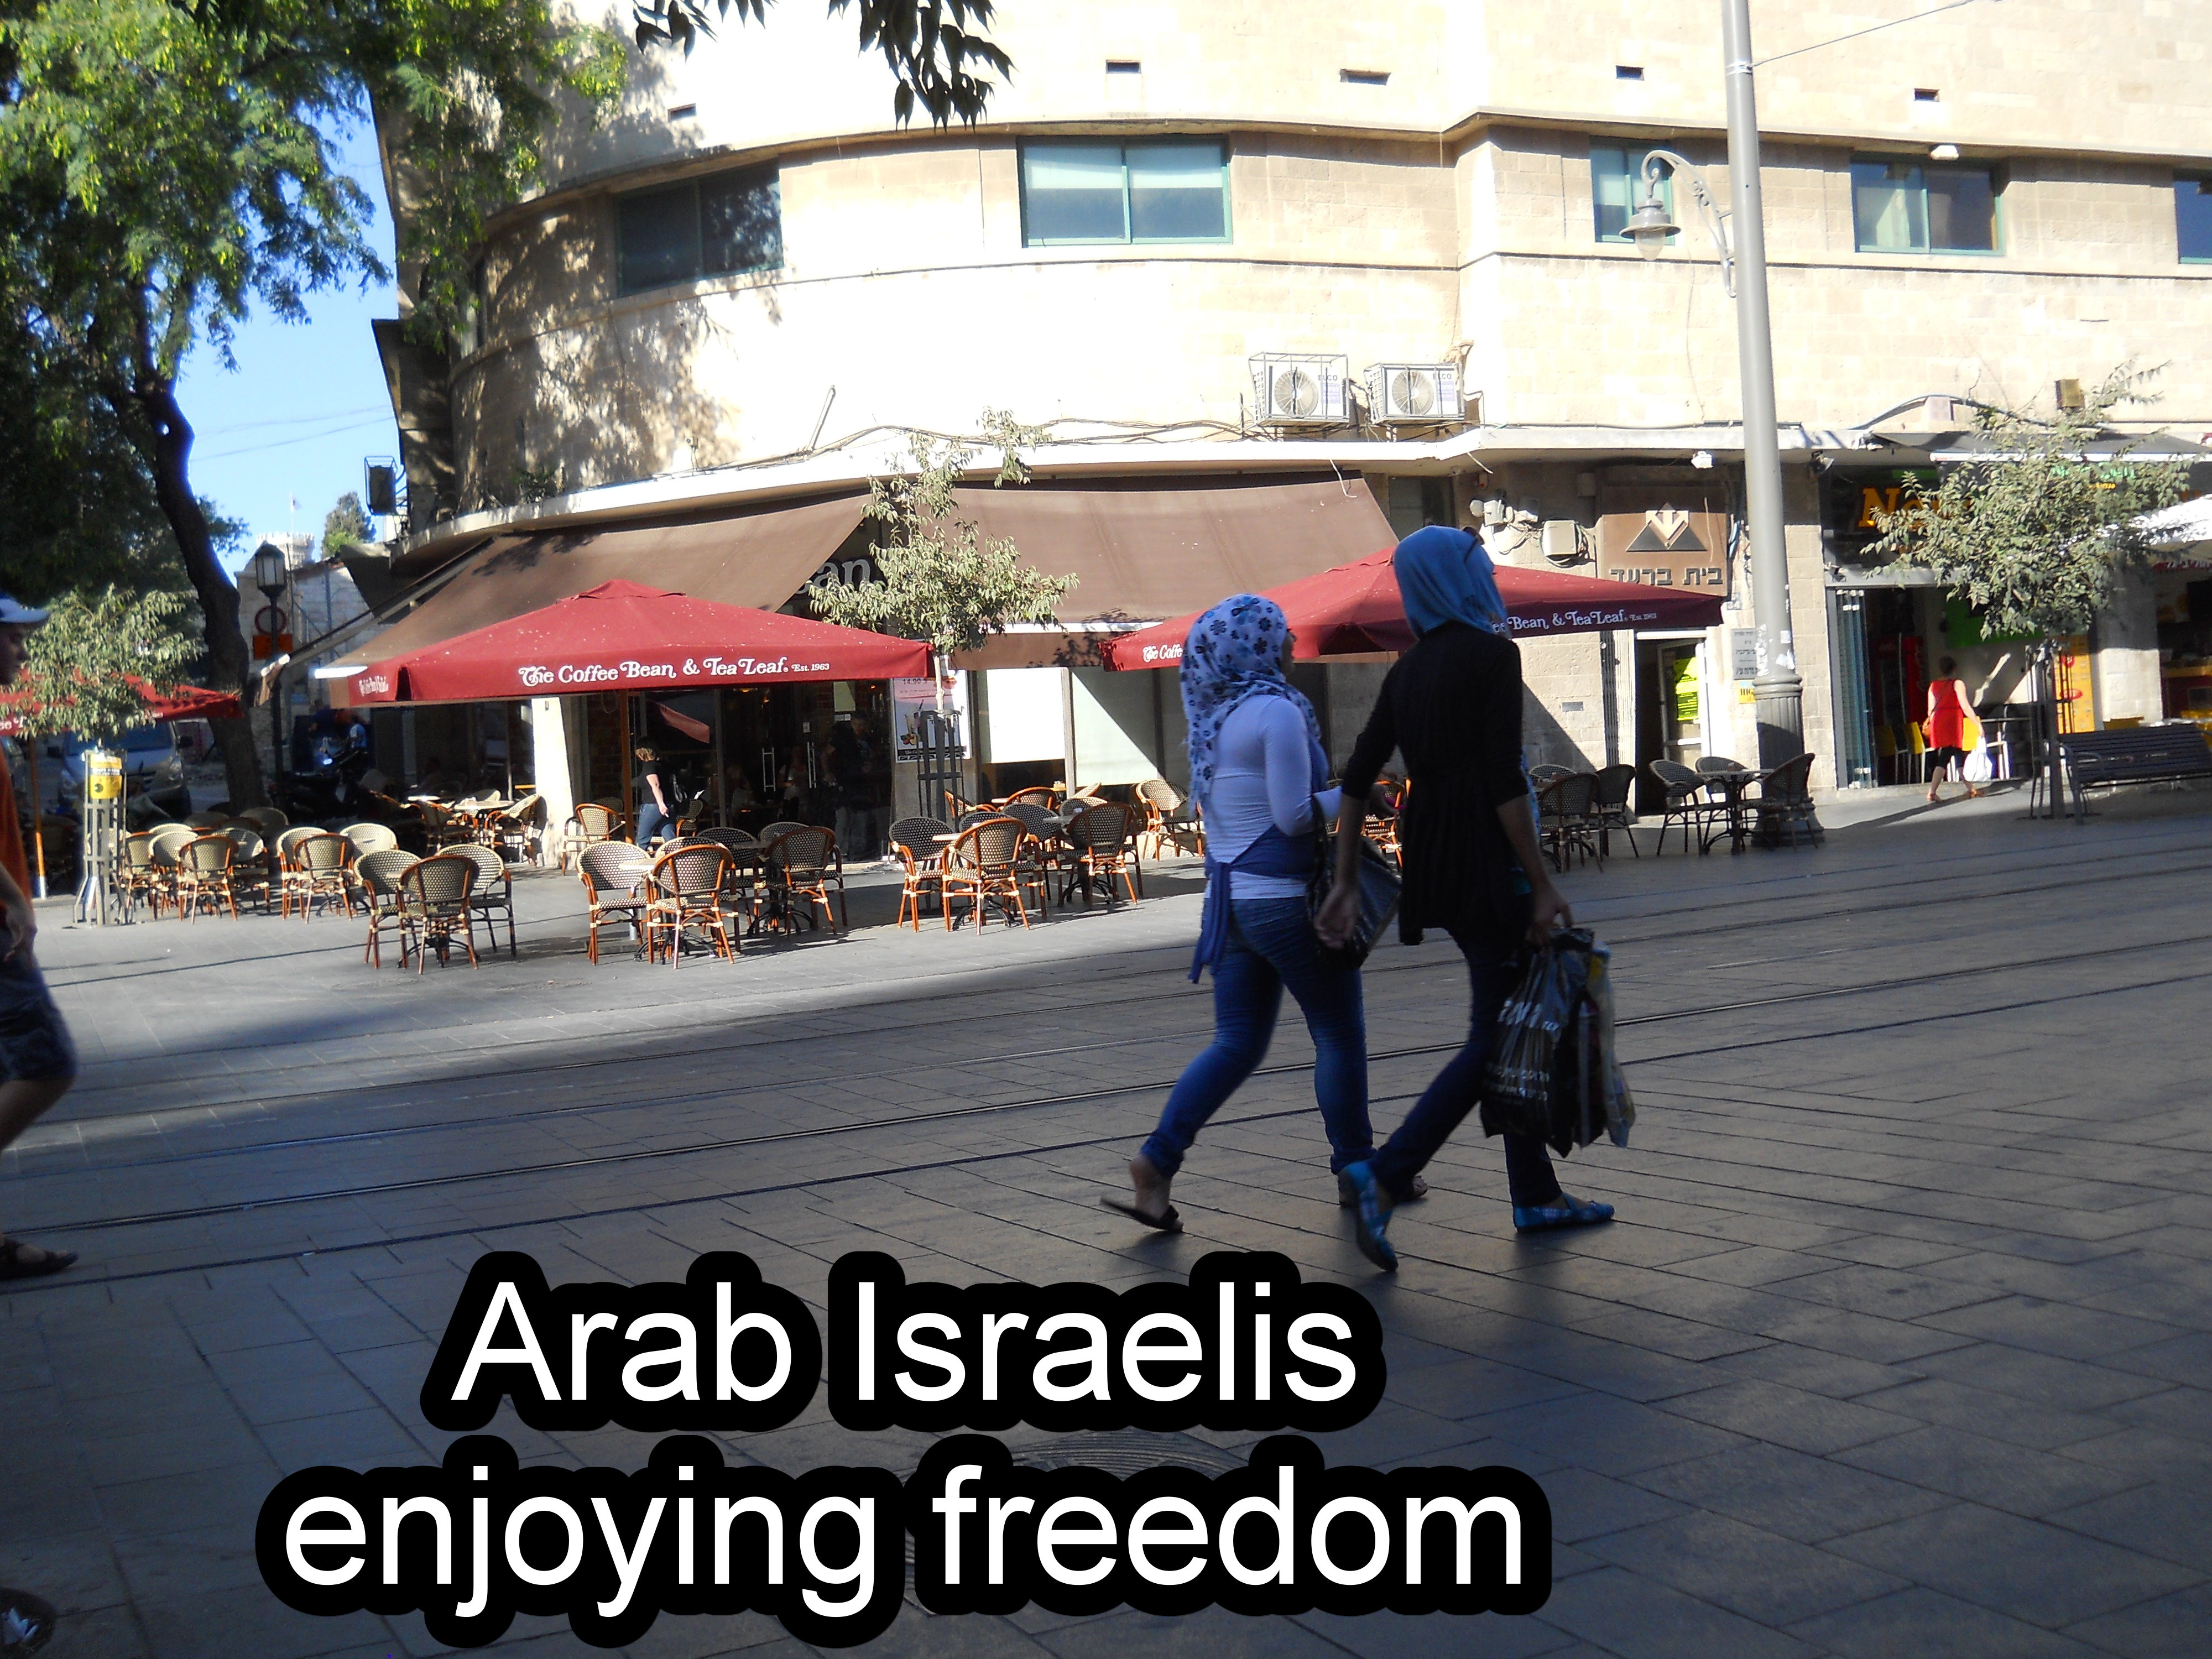 Apartheid16